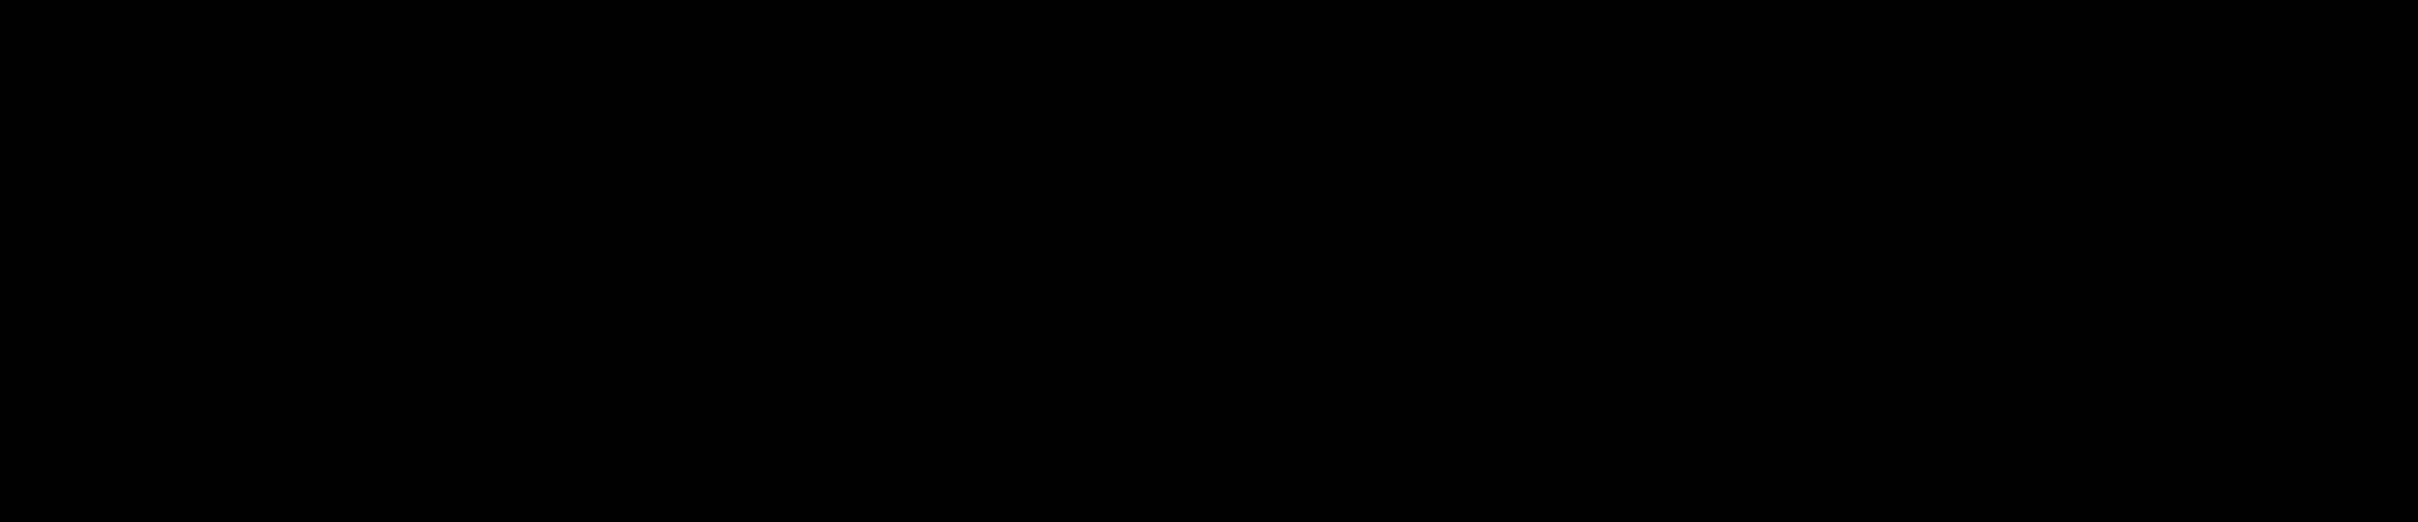 futurewife_2016_logo_black_v01.png